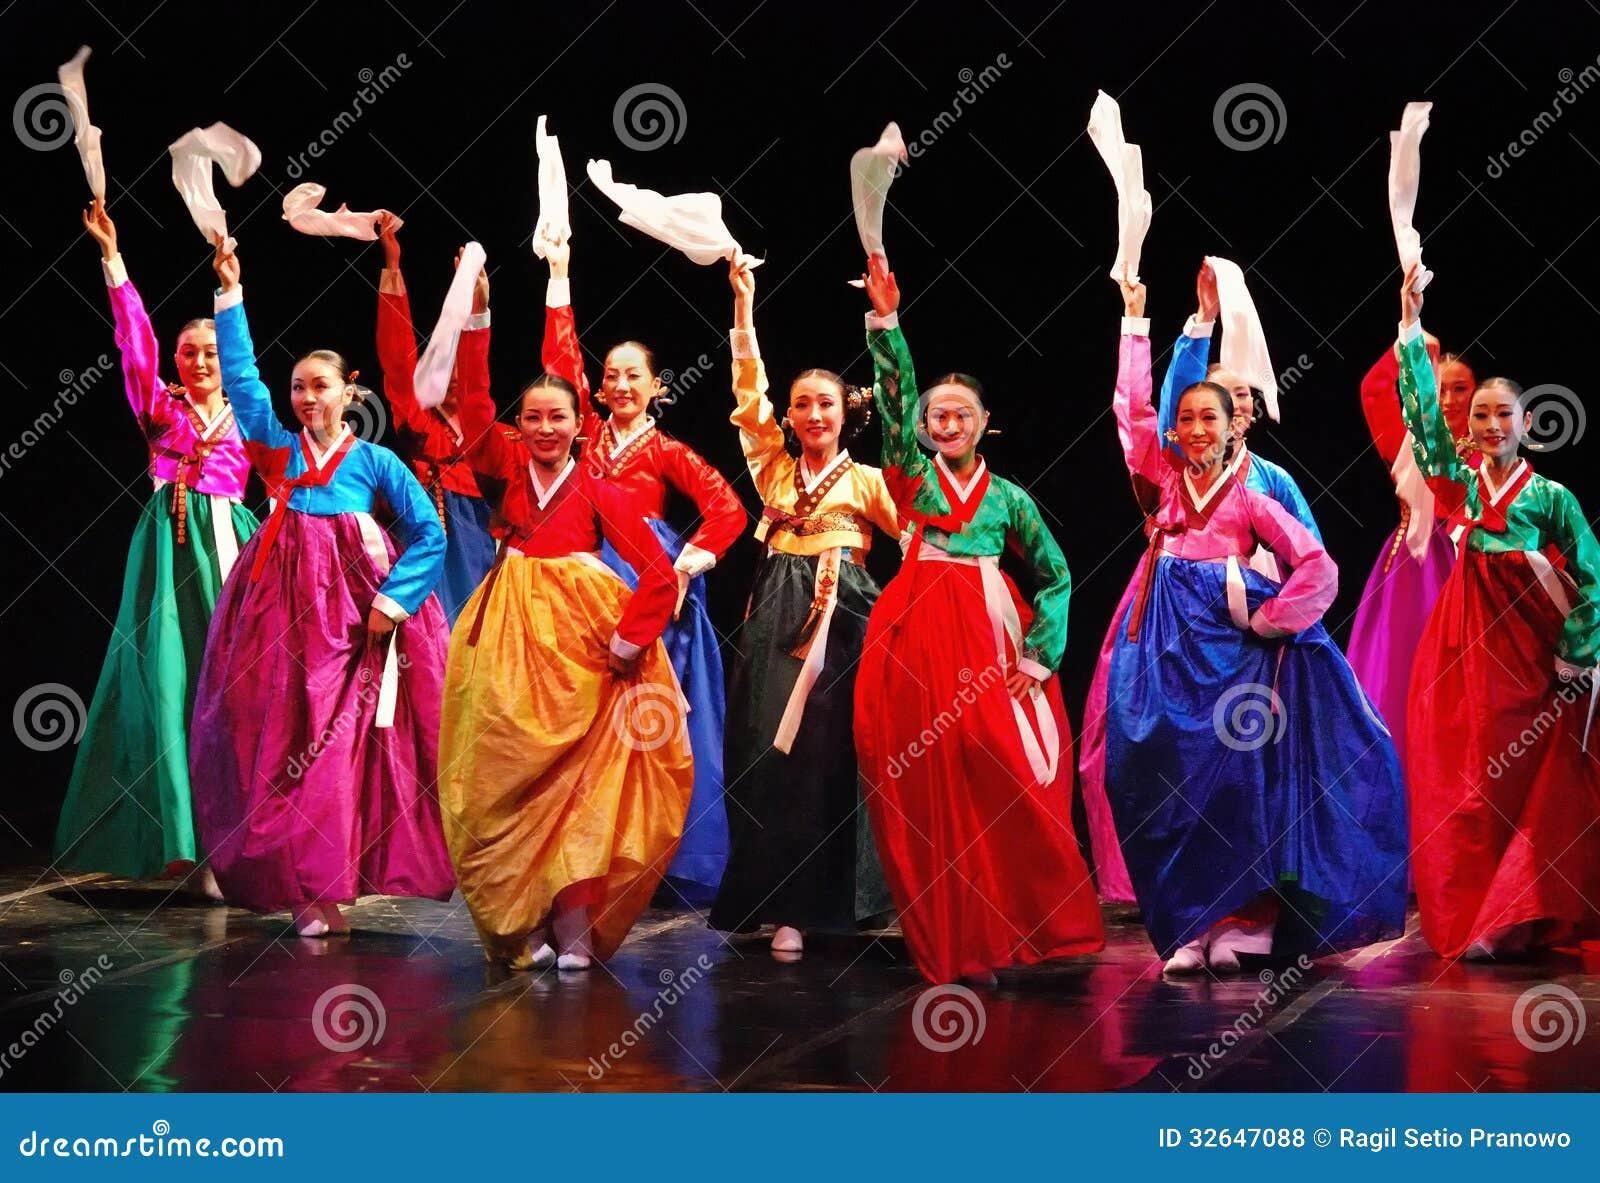 Performers Of Busan Korean Traditional Dance Editorial Stock Photo  Image: 32647088